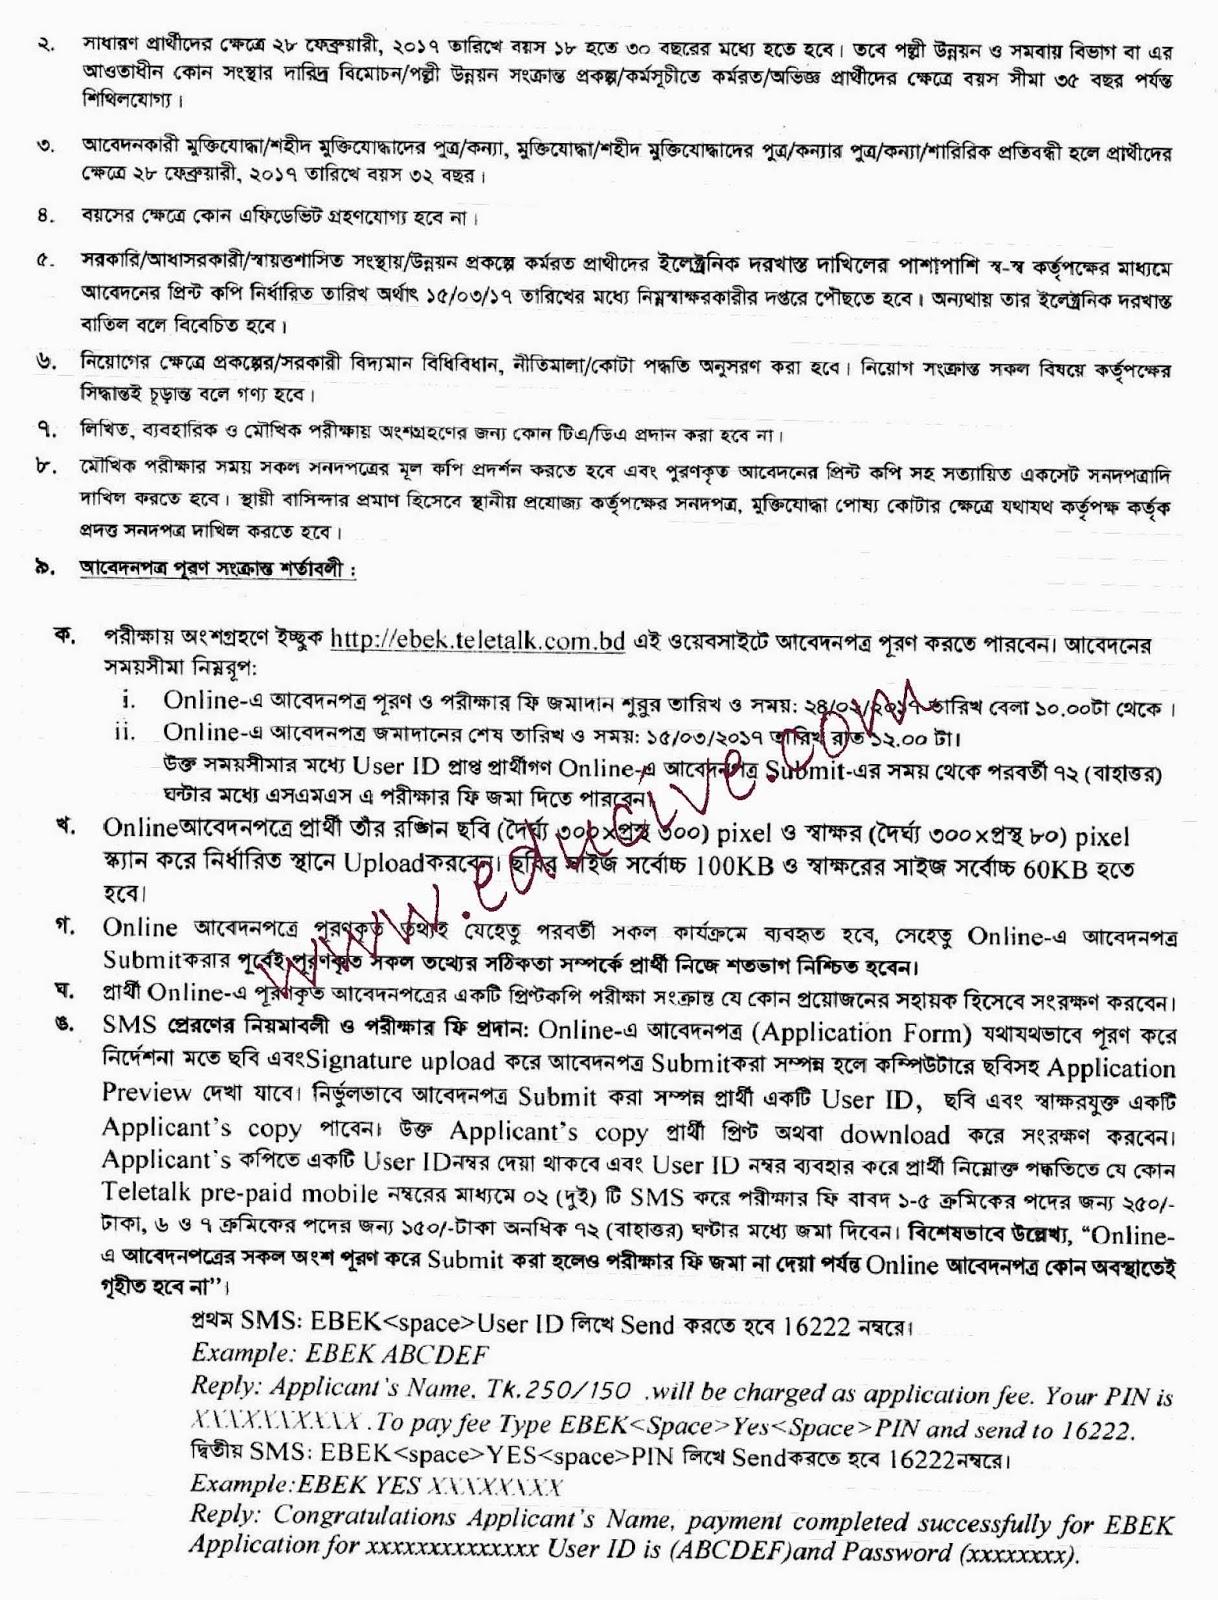 ekti bari ekti khamar job circular www.ebek.teletalk.com.bd